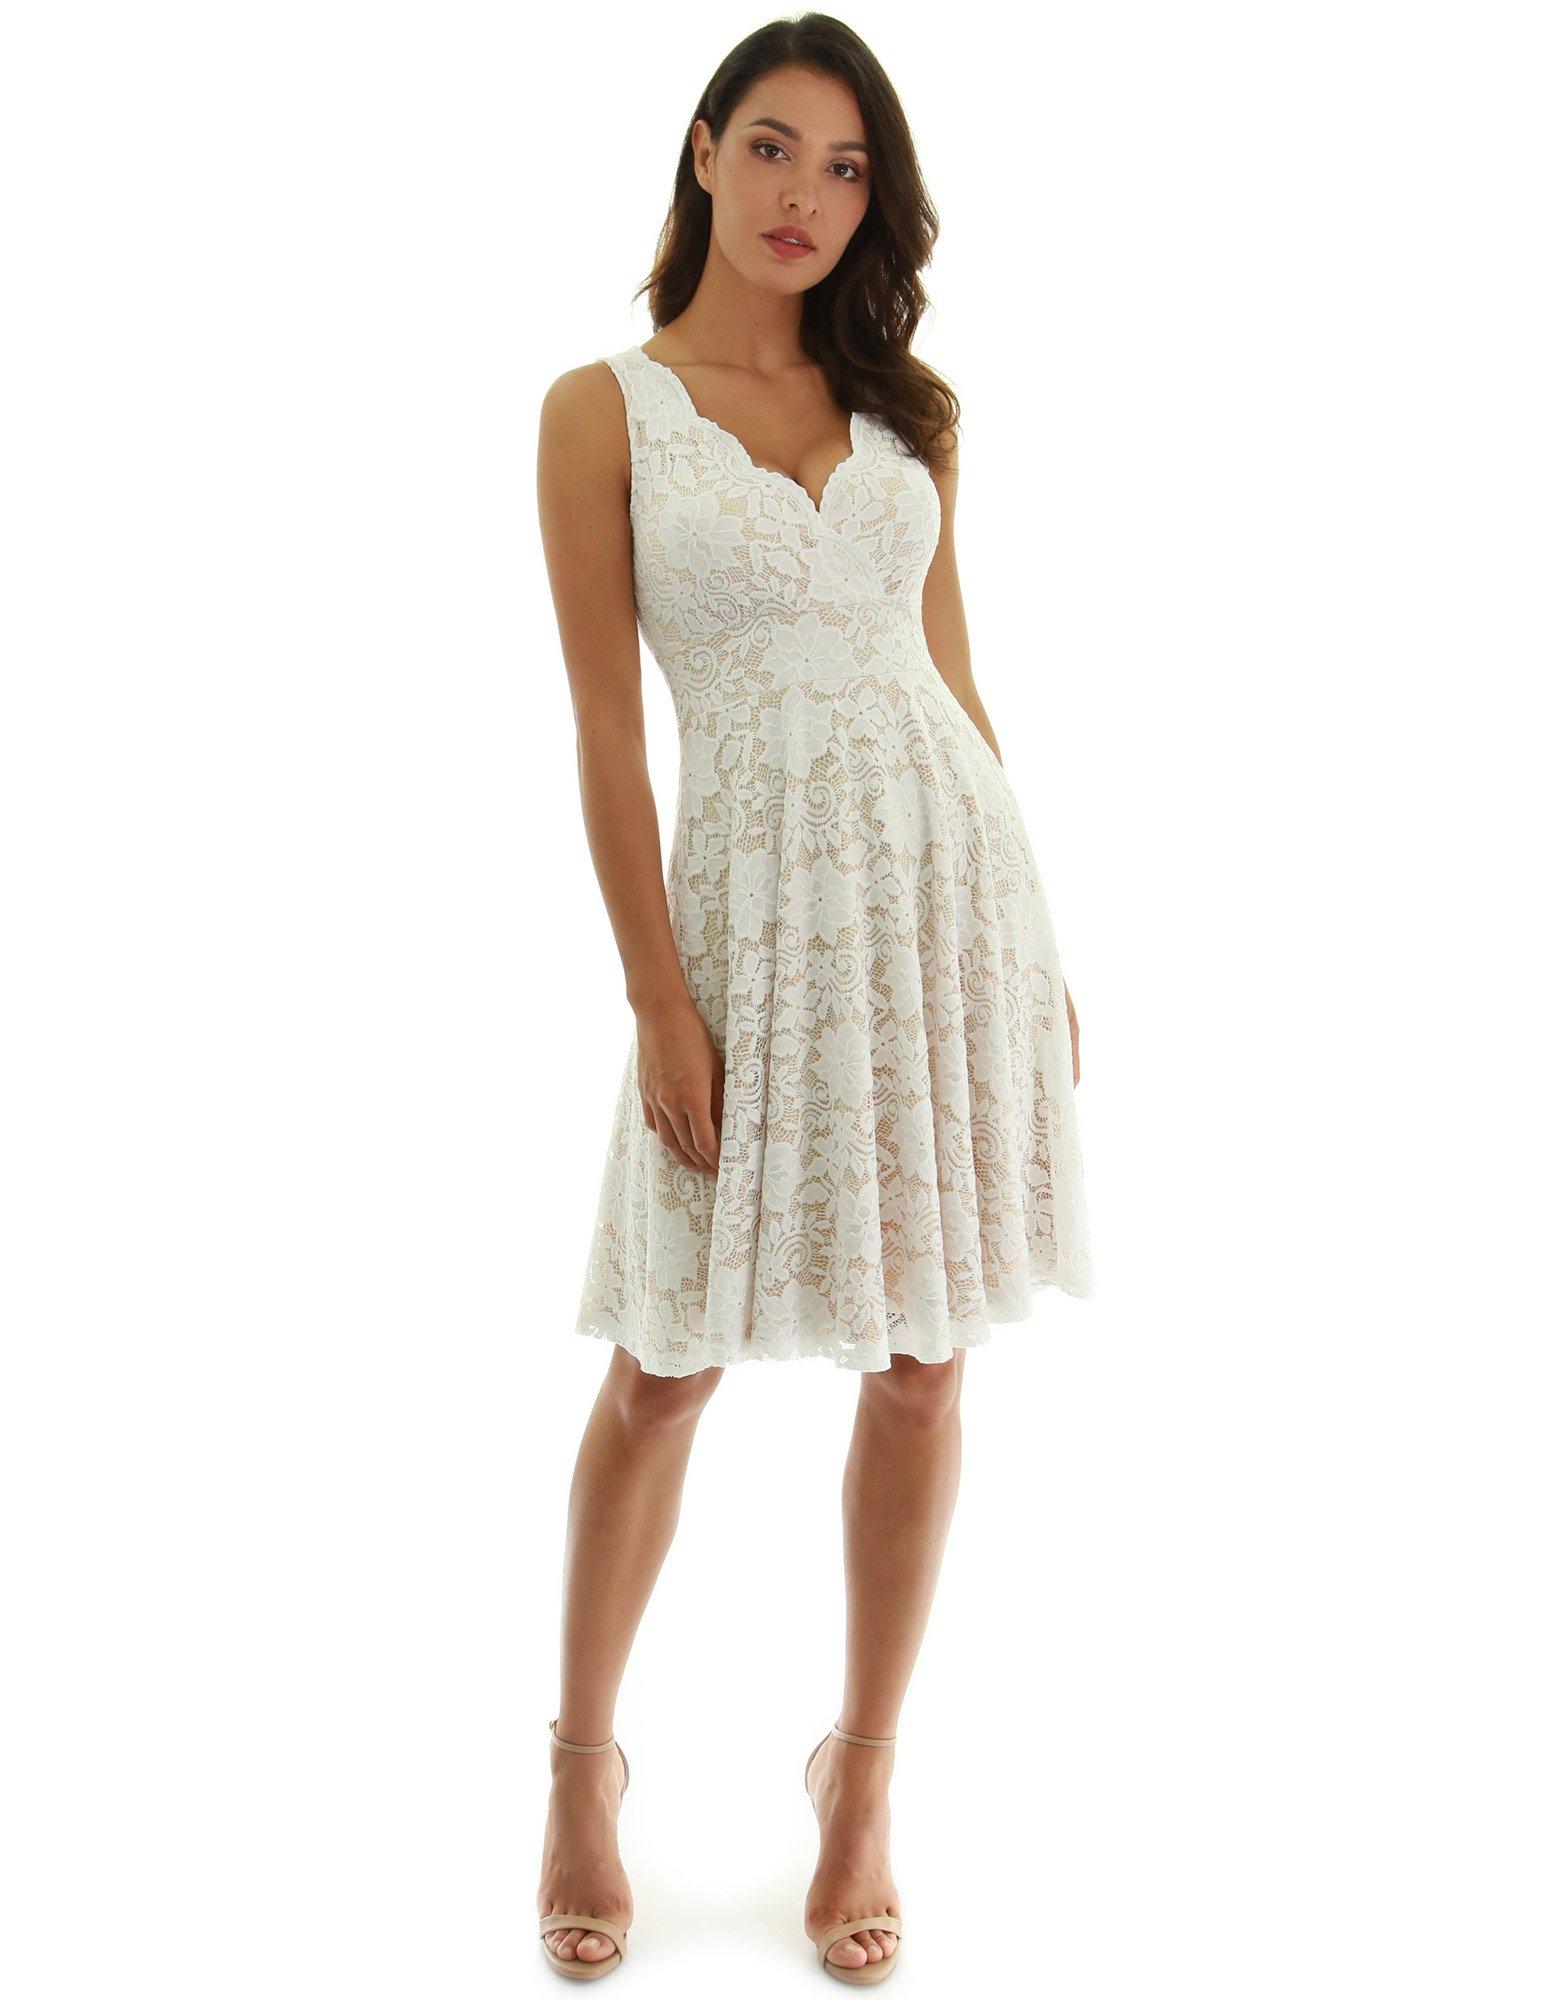 White Dress - Women's 1920s Black Sequin Gatsby Maxi Long Evening Prom Dress